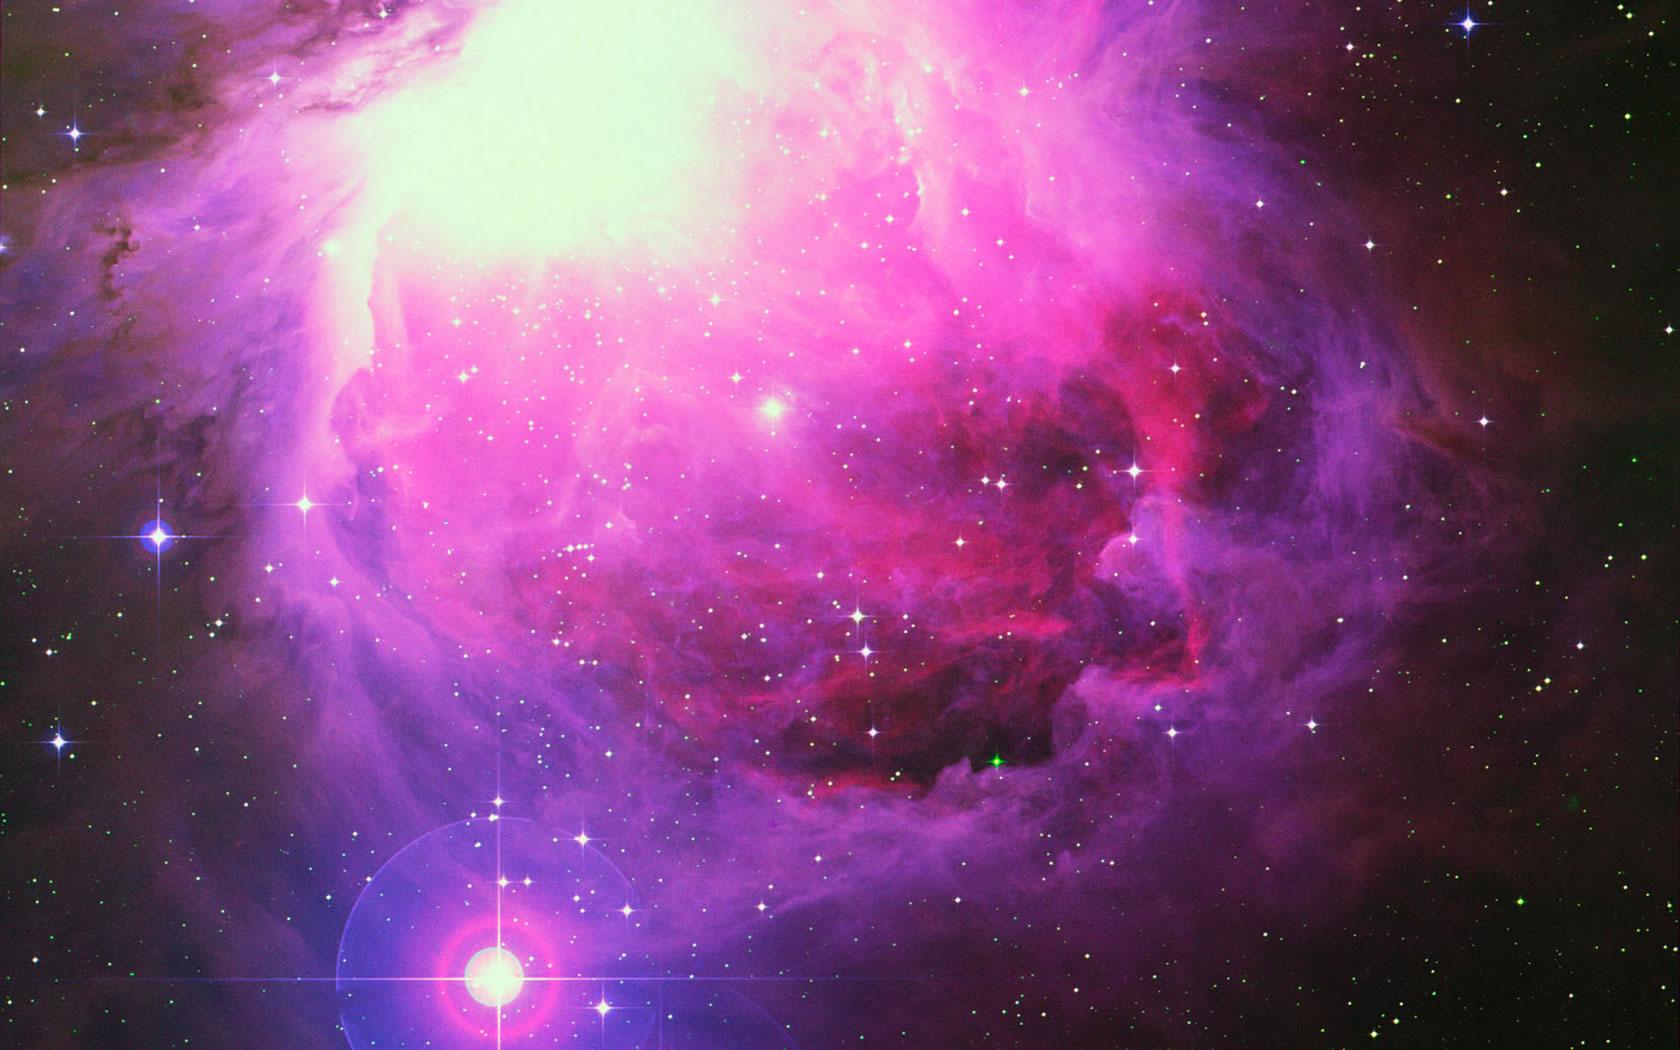 Download Wallpaper Horse Nebula - tumblr_static_5jjhjl5ctcsgwsow4w8k8s80s  Best Photo Reference_42736.jpg